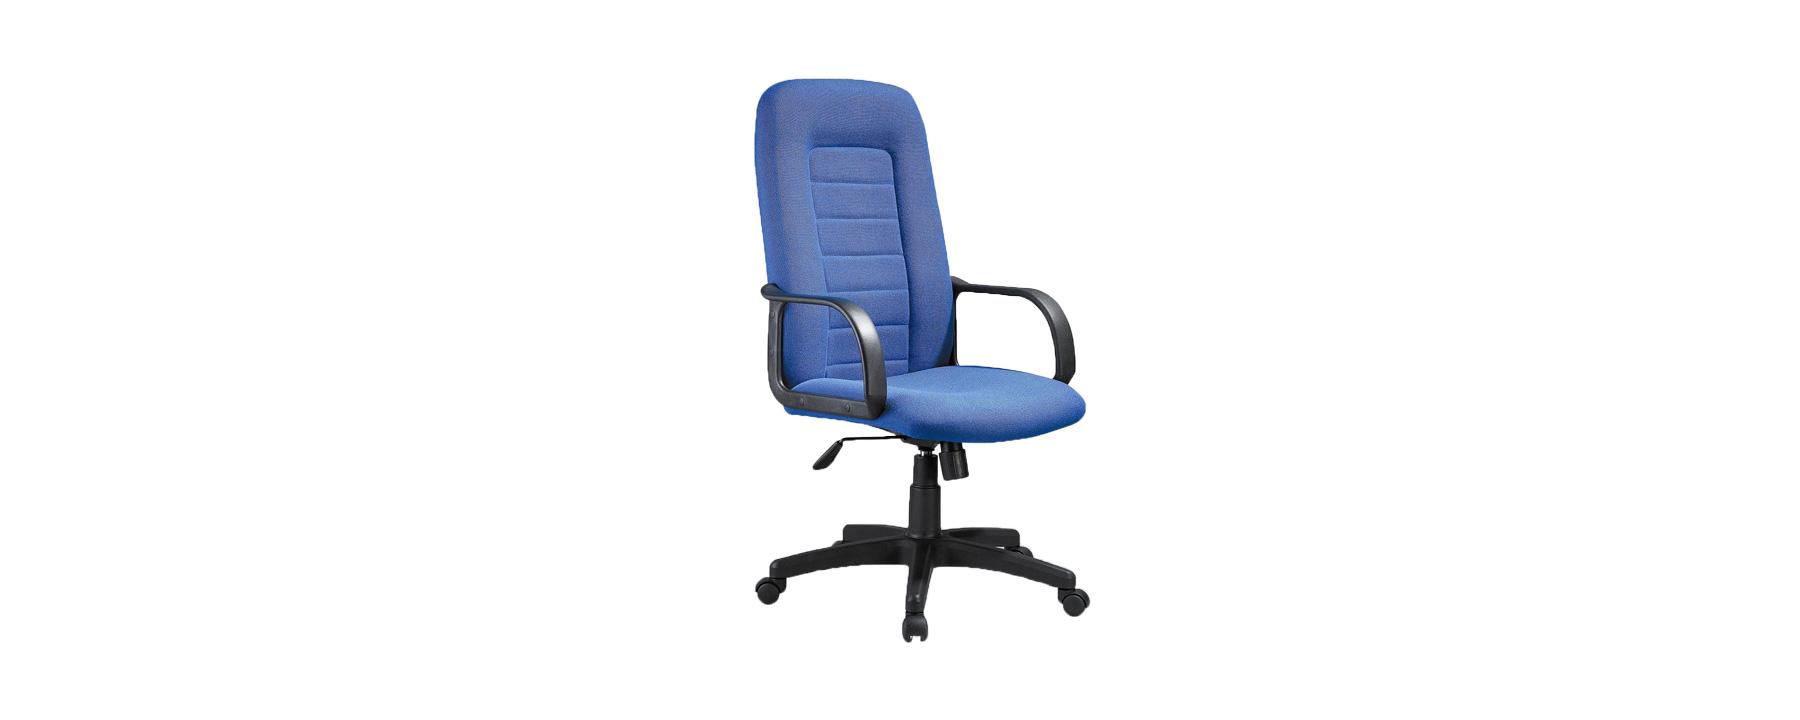 Office chairs in sri lanka - Fabric Chair High Back